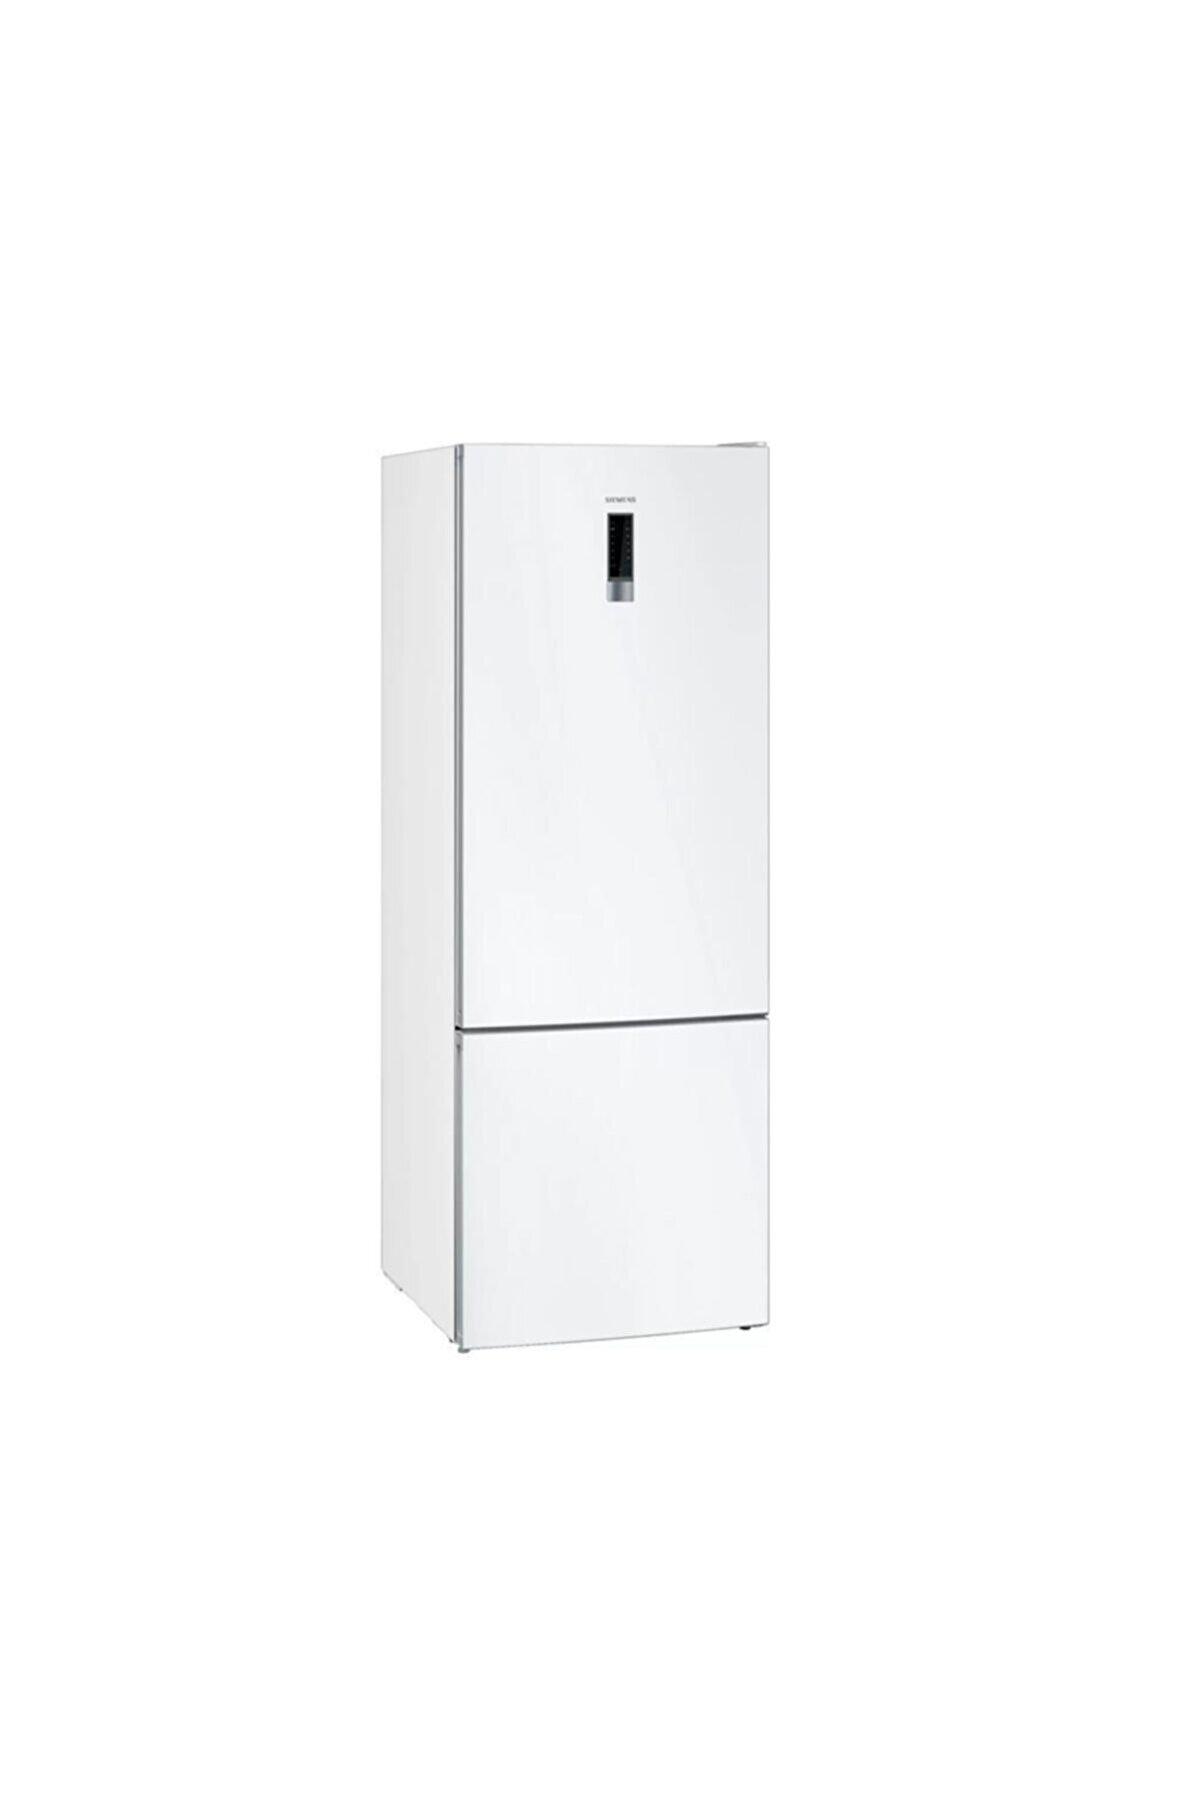 Siemens Kg56nvwf0n A++ 559 Lt No-frost Kombi Tipi Buzdolabı-beyaz